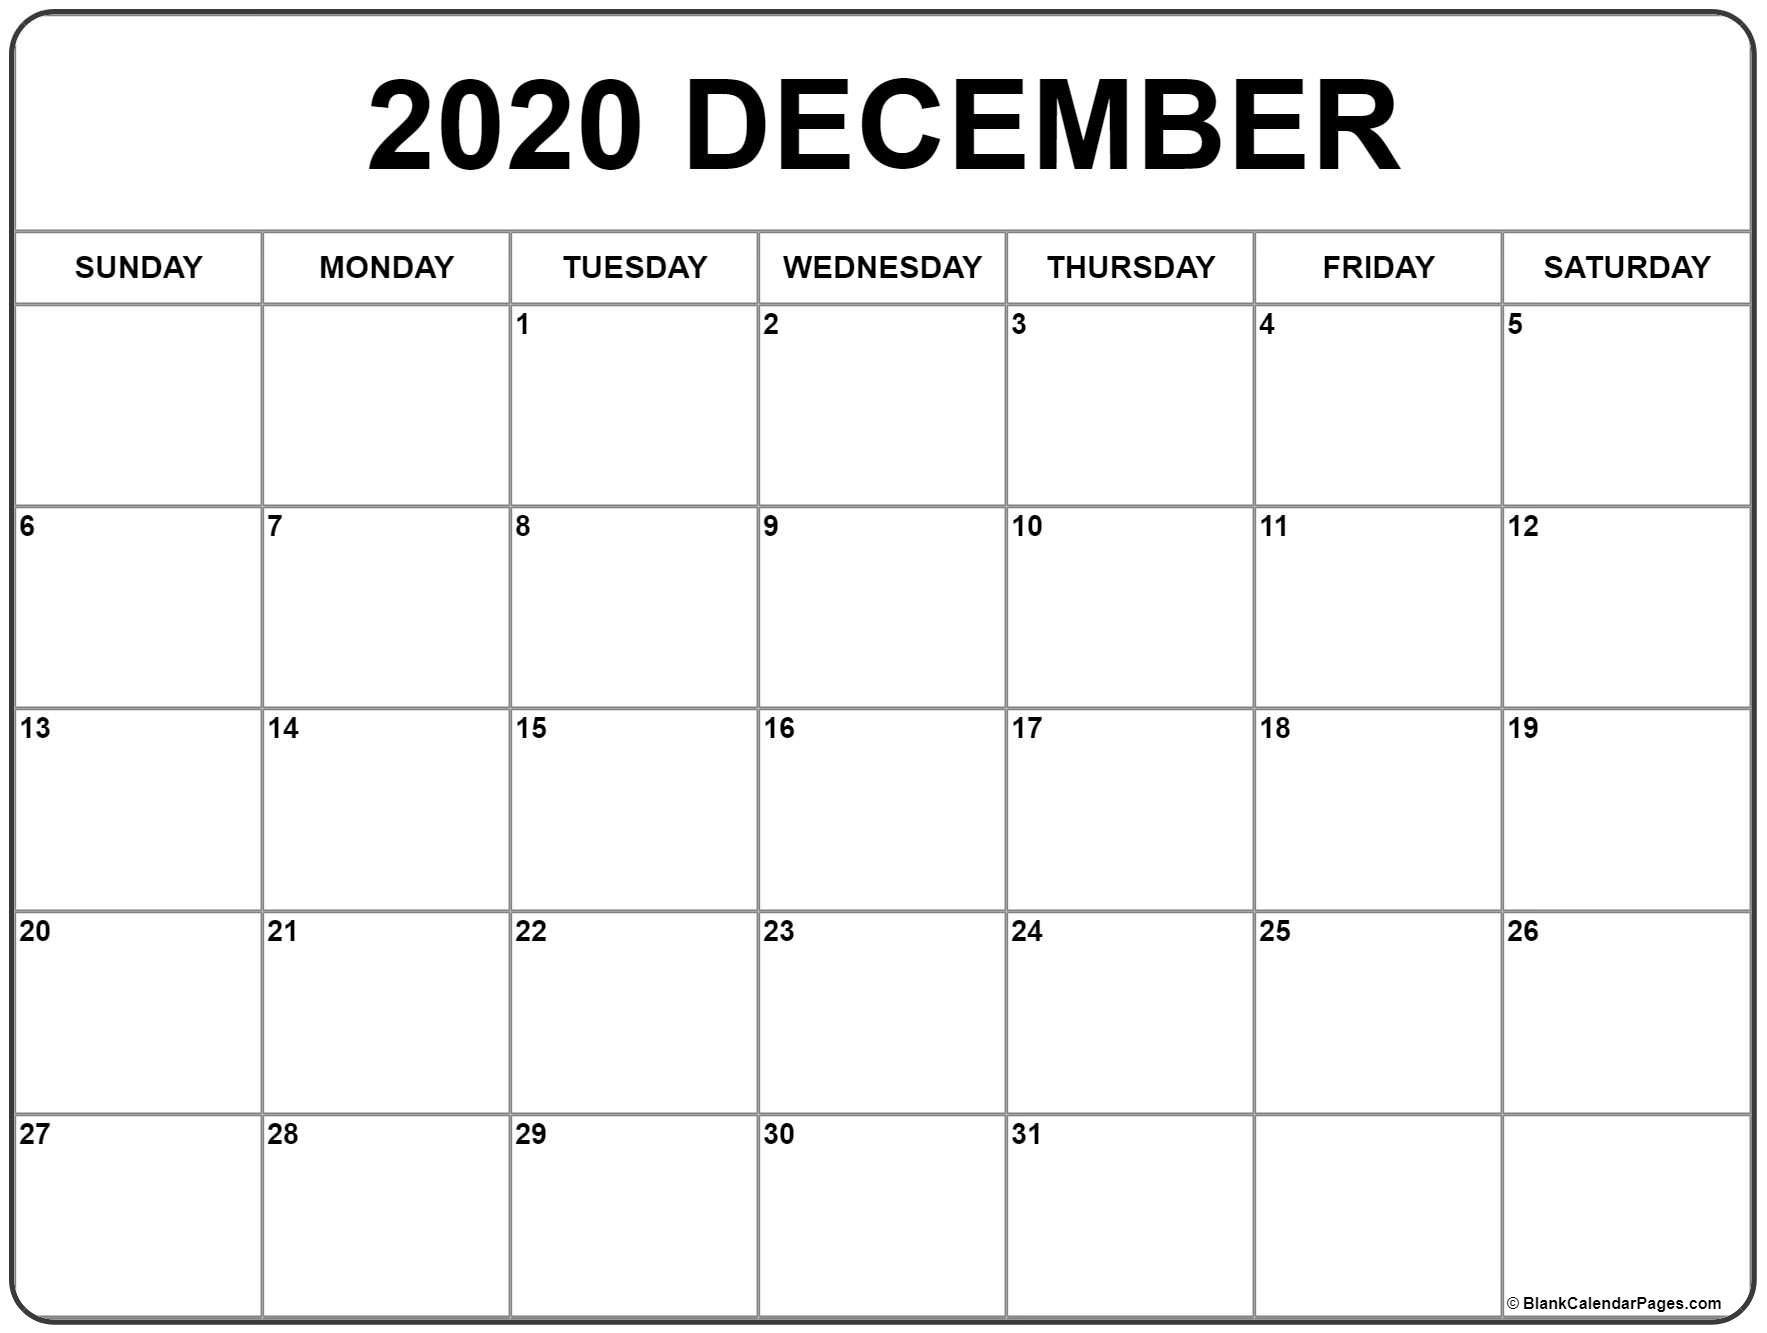 December 2020 Printable Calendar Template #2020Calendars Remarkable 2020 Monthly Calendar Monday Start